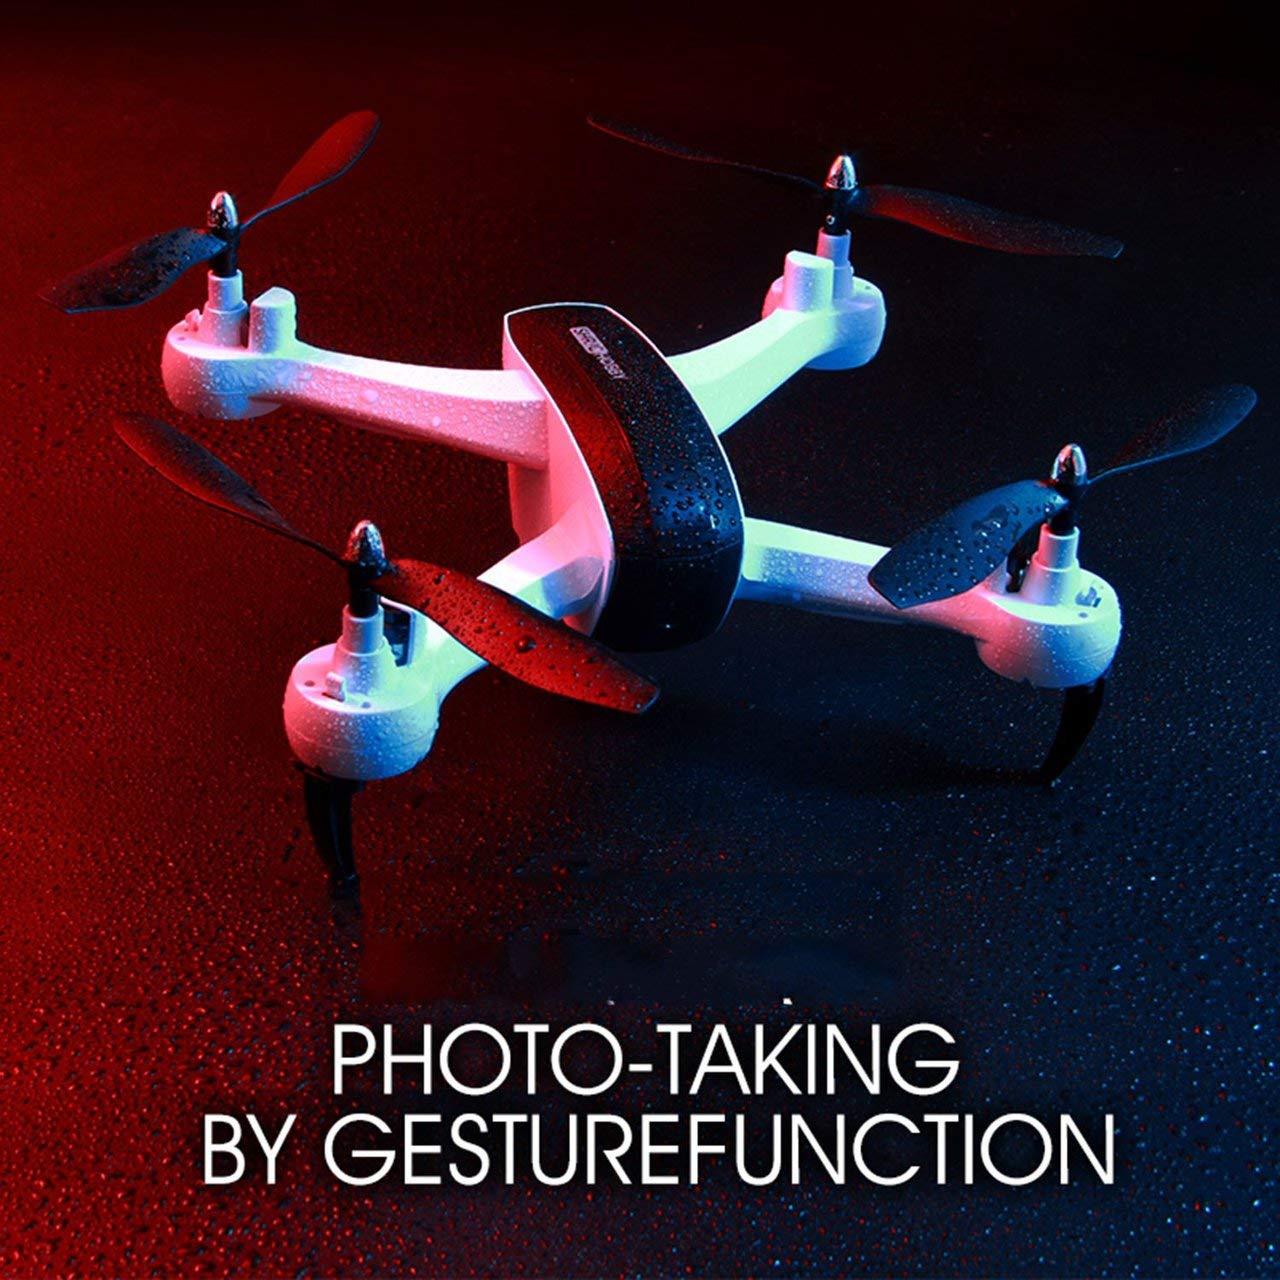 Jasnyfall 1080P WiFi FPV HD Kamera SH7 Set Höhe schwebende Geature Selfie RC Drohne Weiß